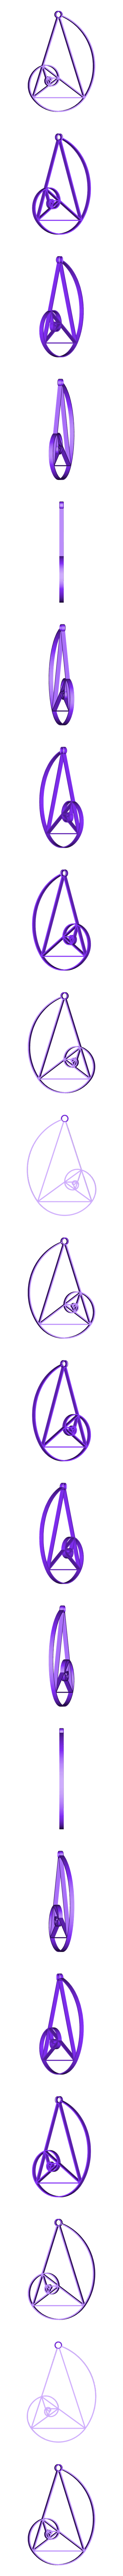 LogaSpiral100mm.stl Download free STL file Logarithmic Spiral, Golden Triangle, Golden Gnomon, Spira Mirabilis • 3D print object, LGBU